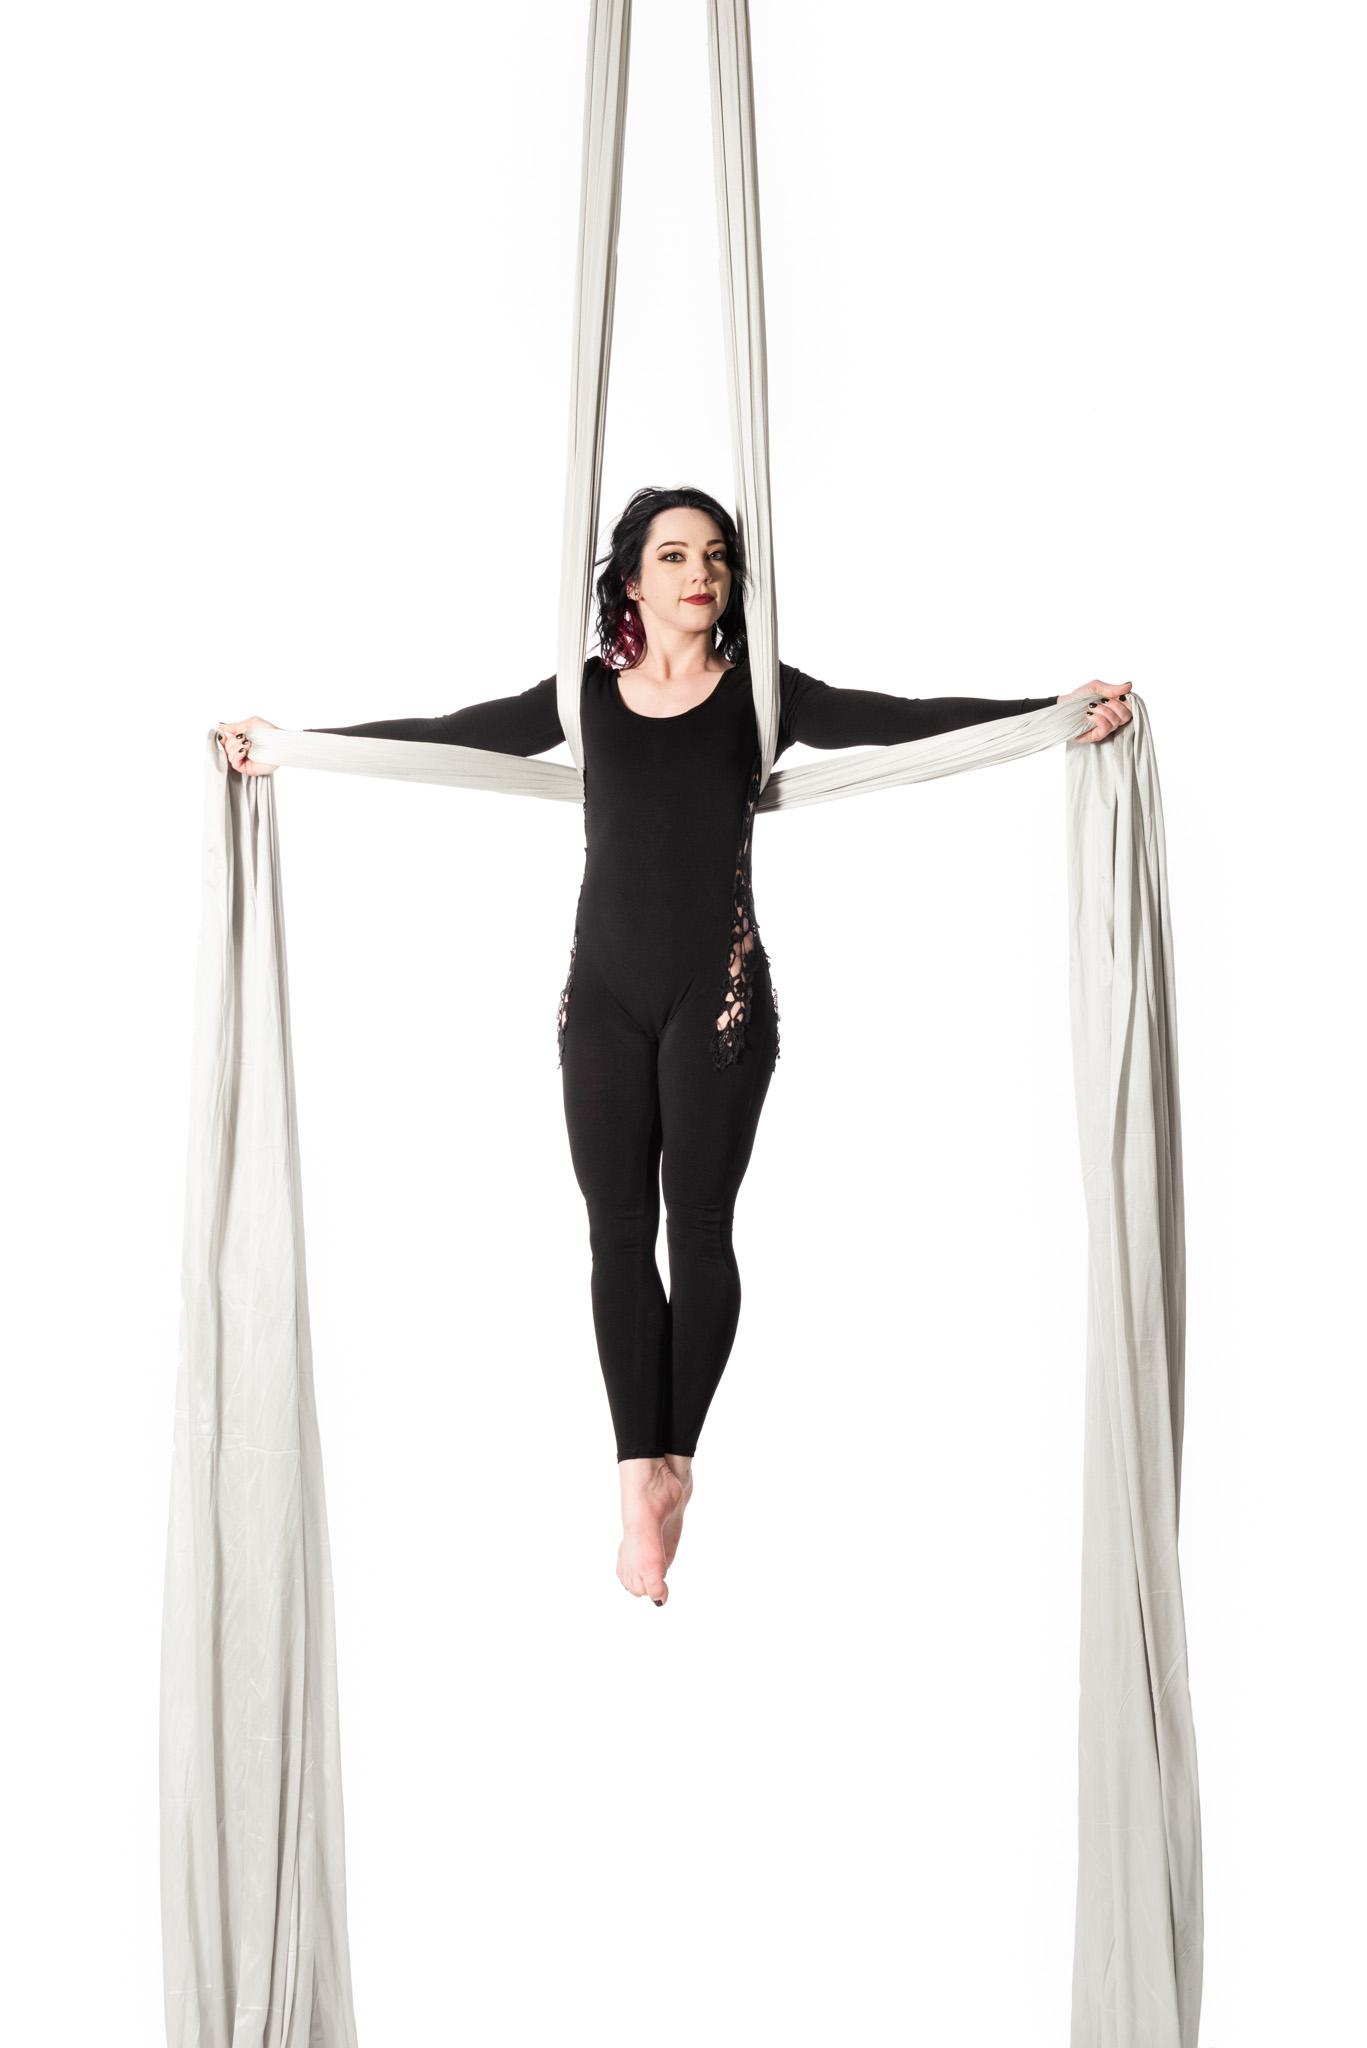 Aradia Fitness Calgary featured Instructor Felicia Salzmann in Iron Cross on silks